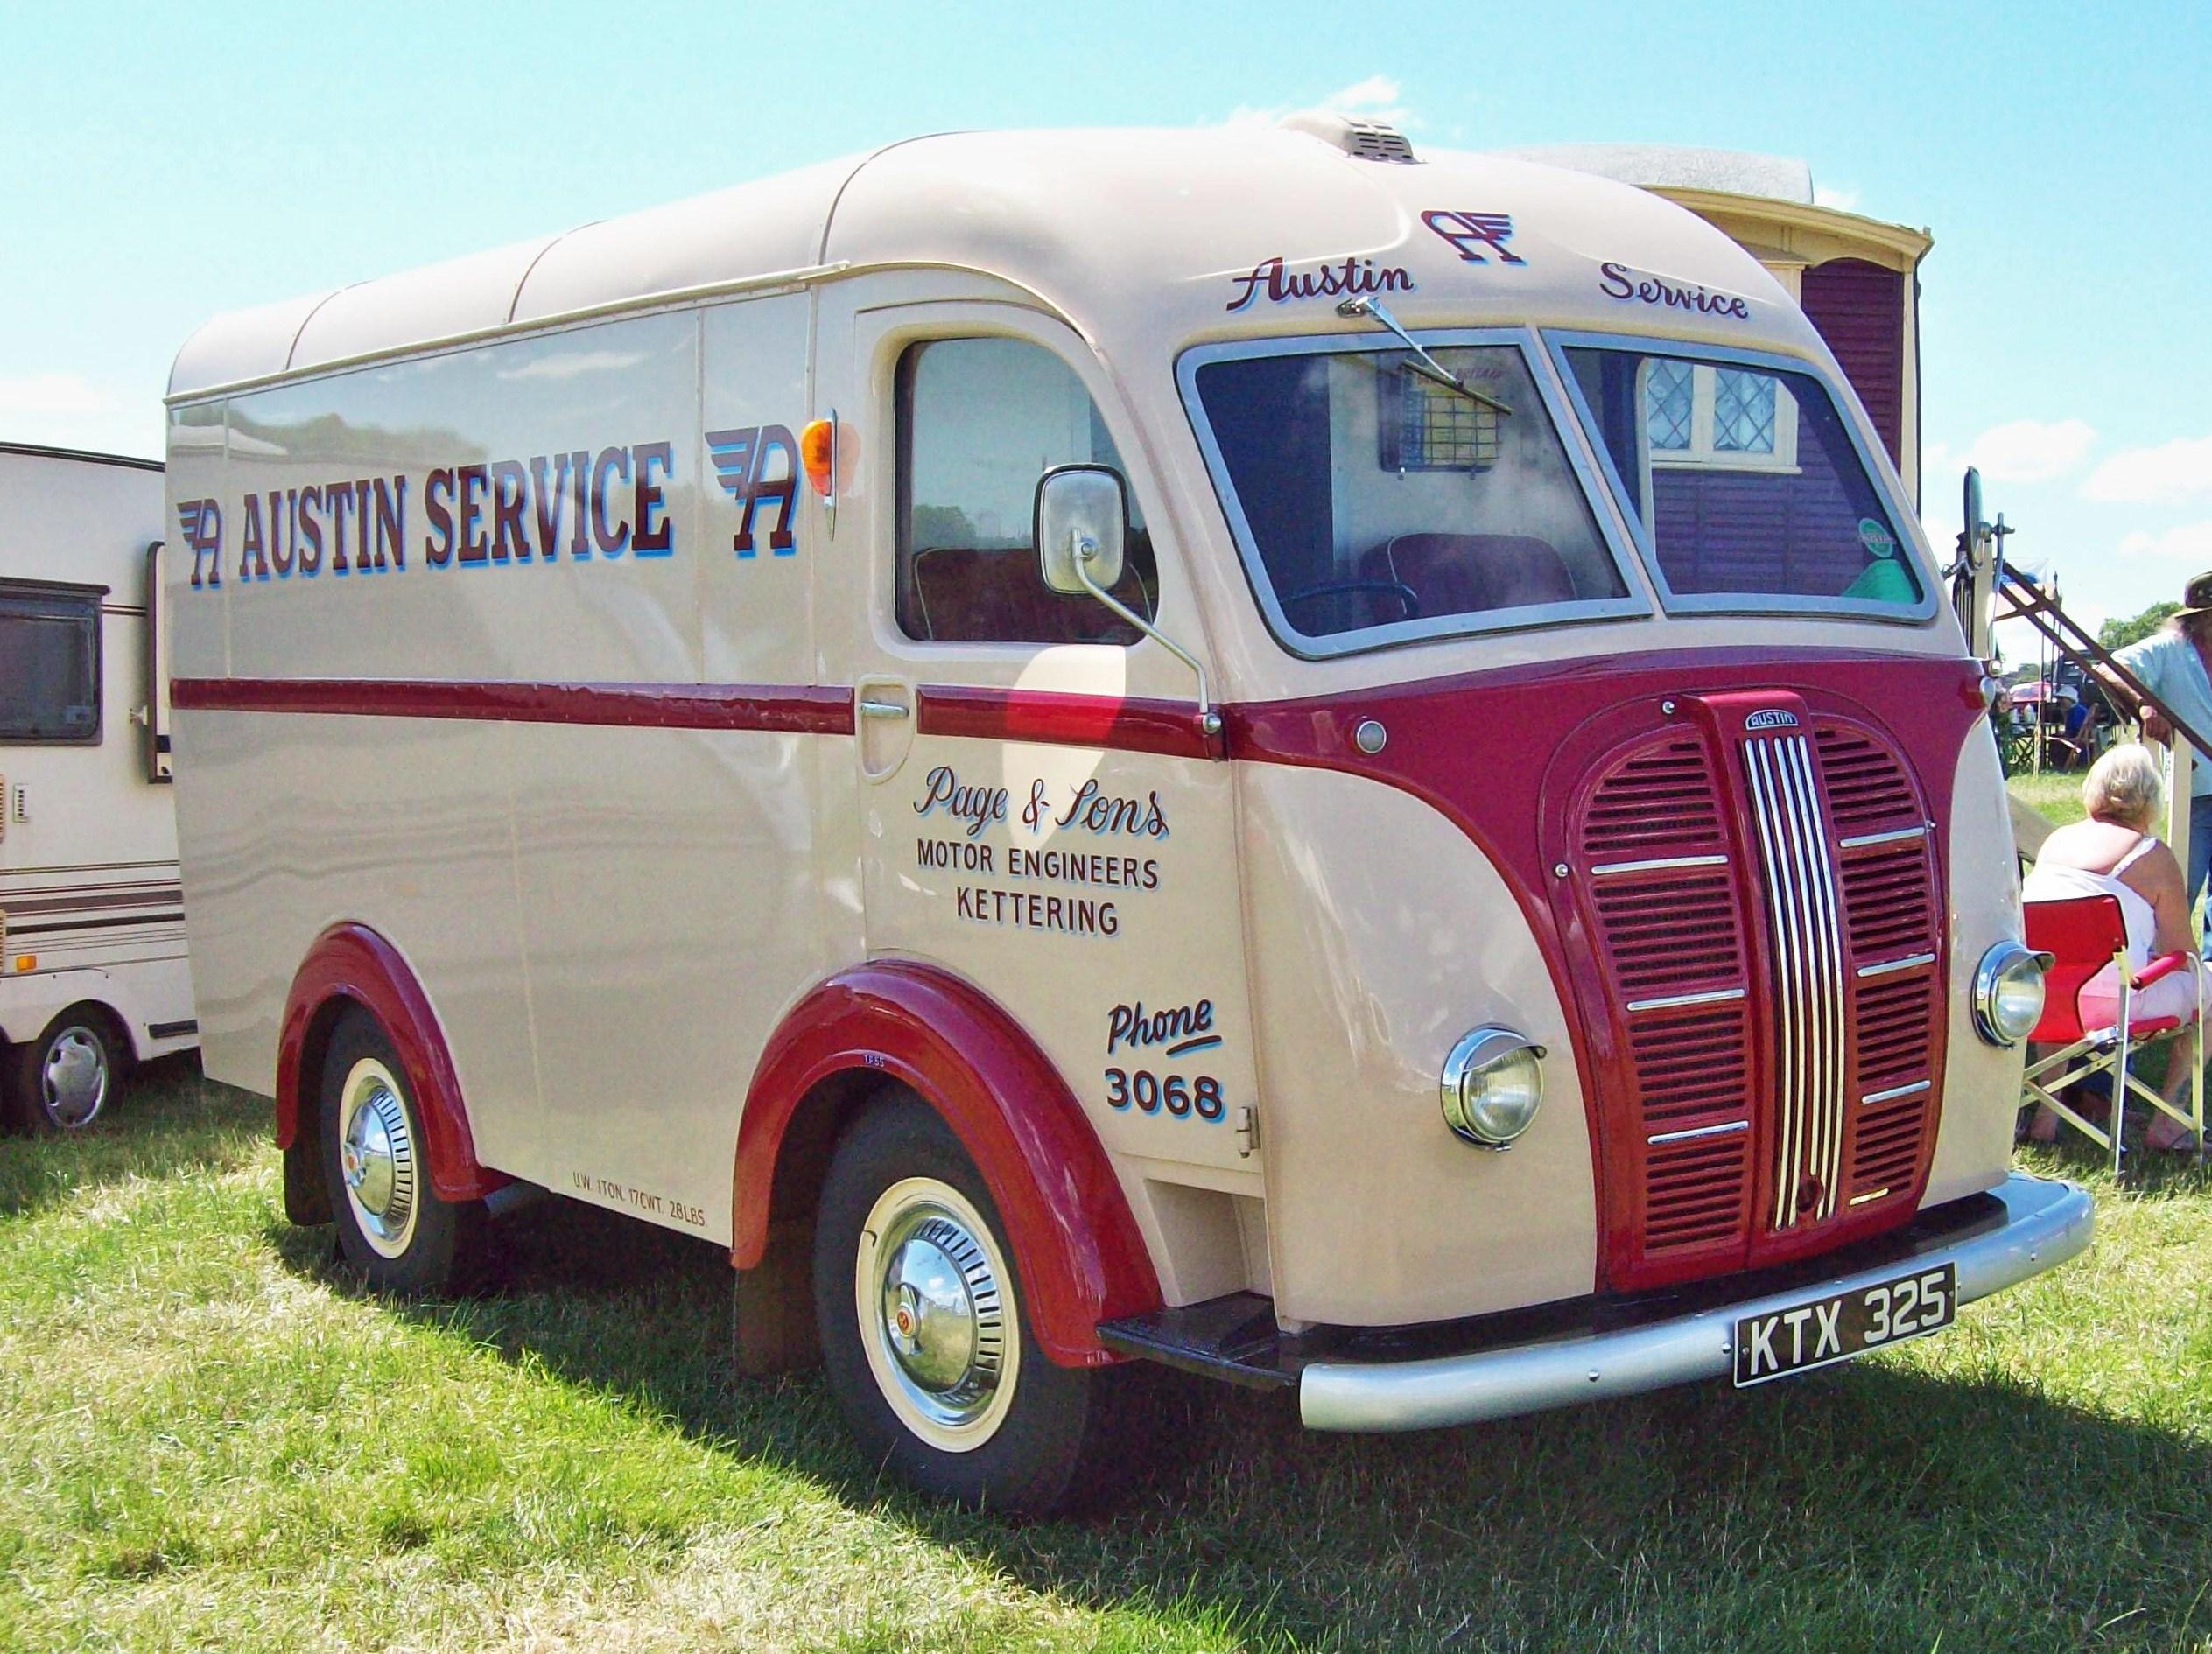 170 austin k4 van 1951 by robertknight16 via flickr vintage british motor vehicles pinterest vans commercial vehicle and cars